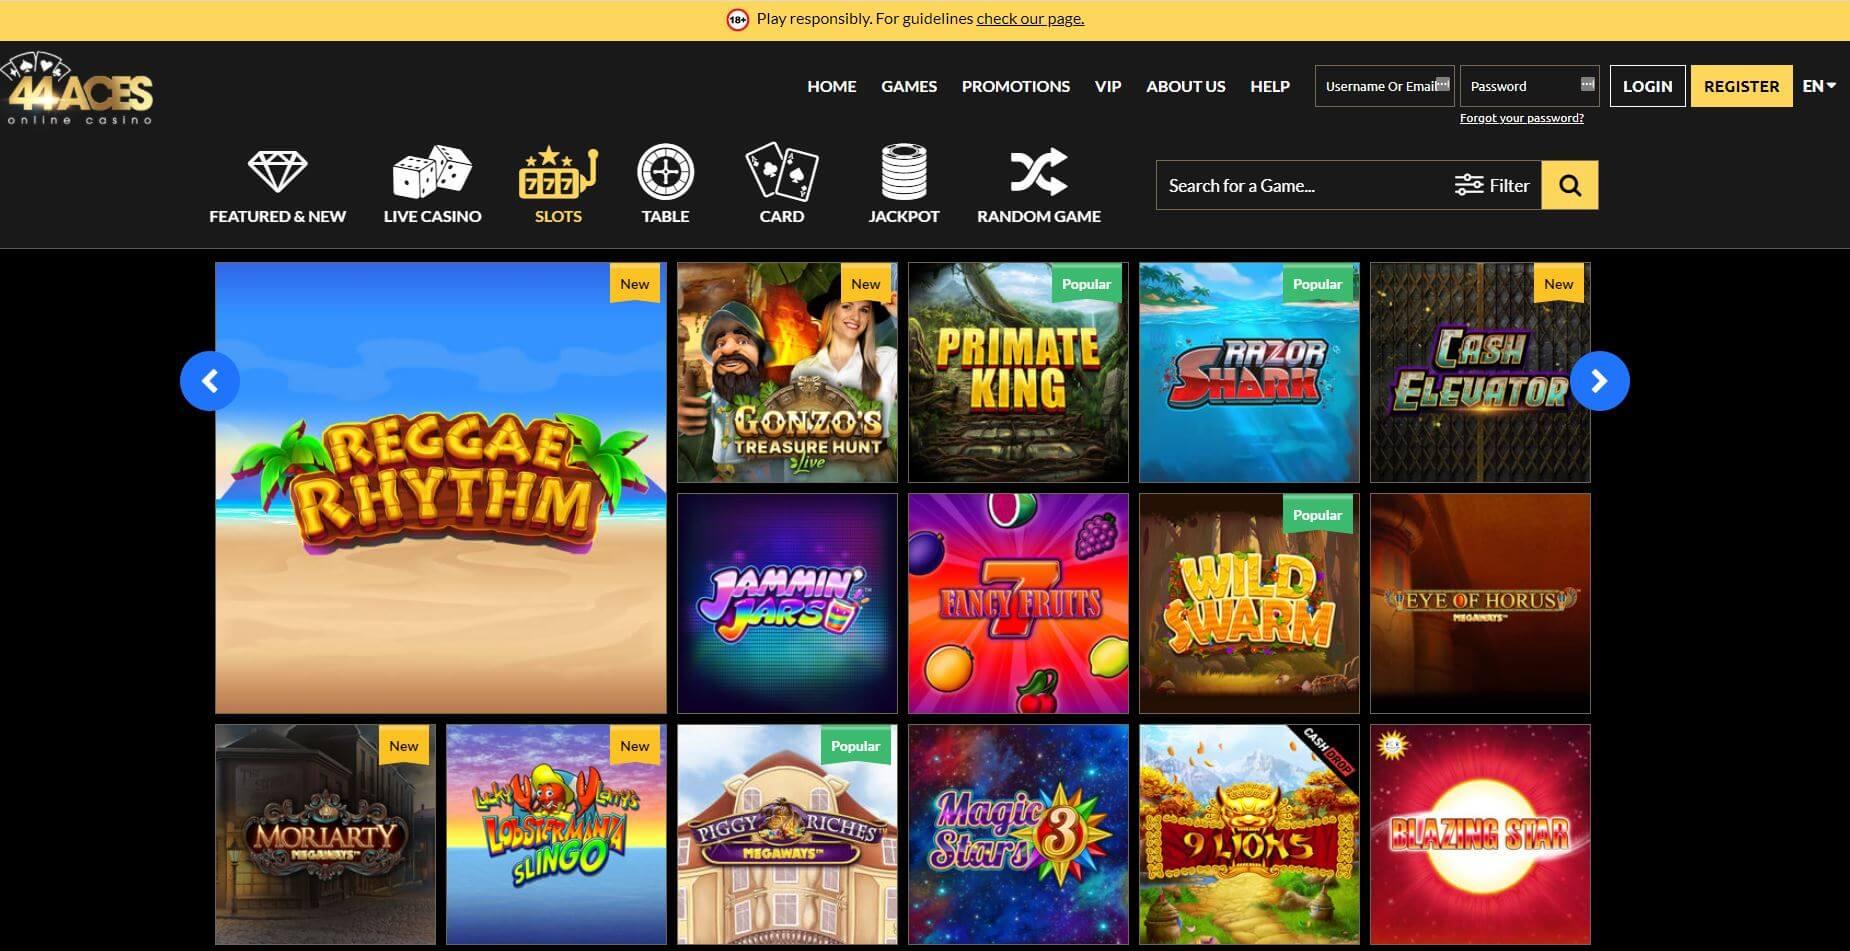 44Aces Casino Slots